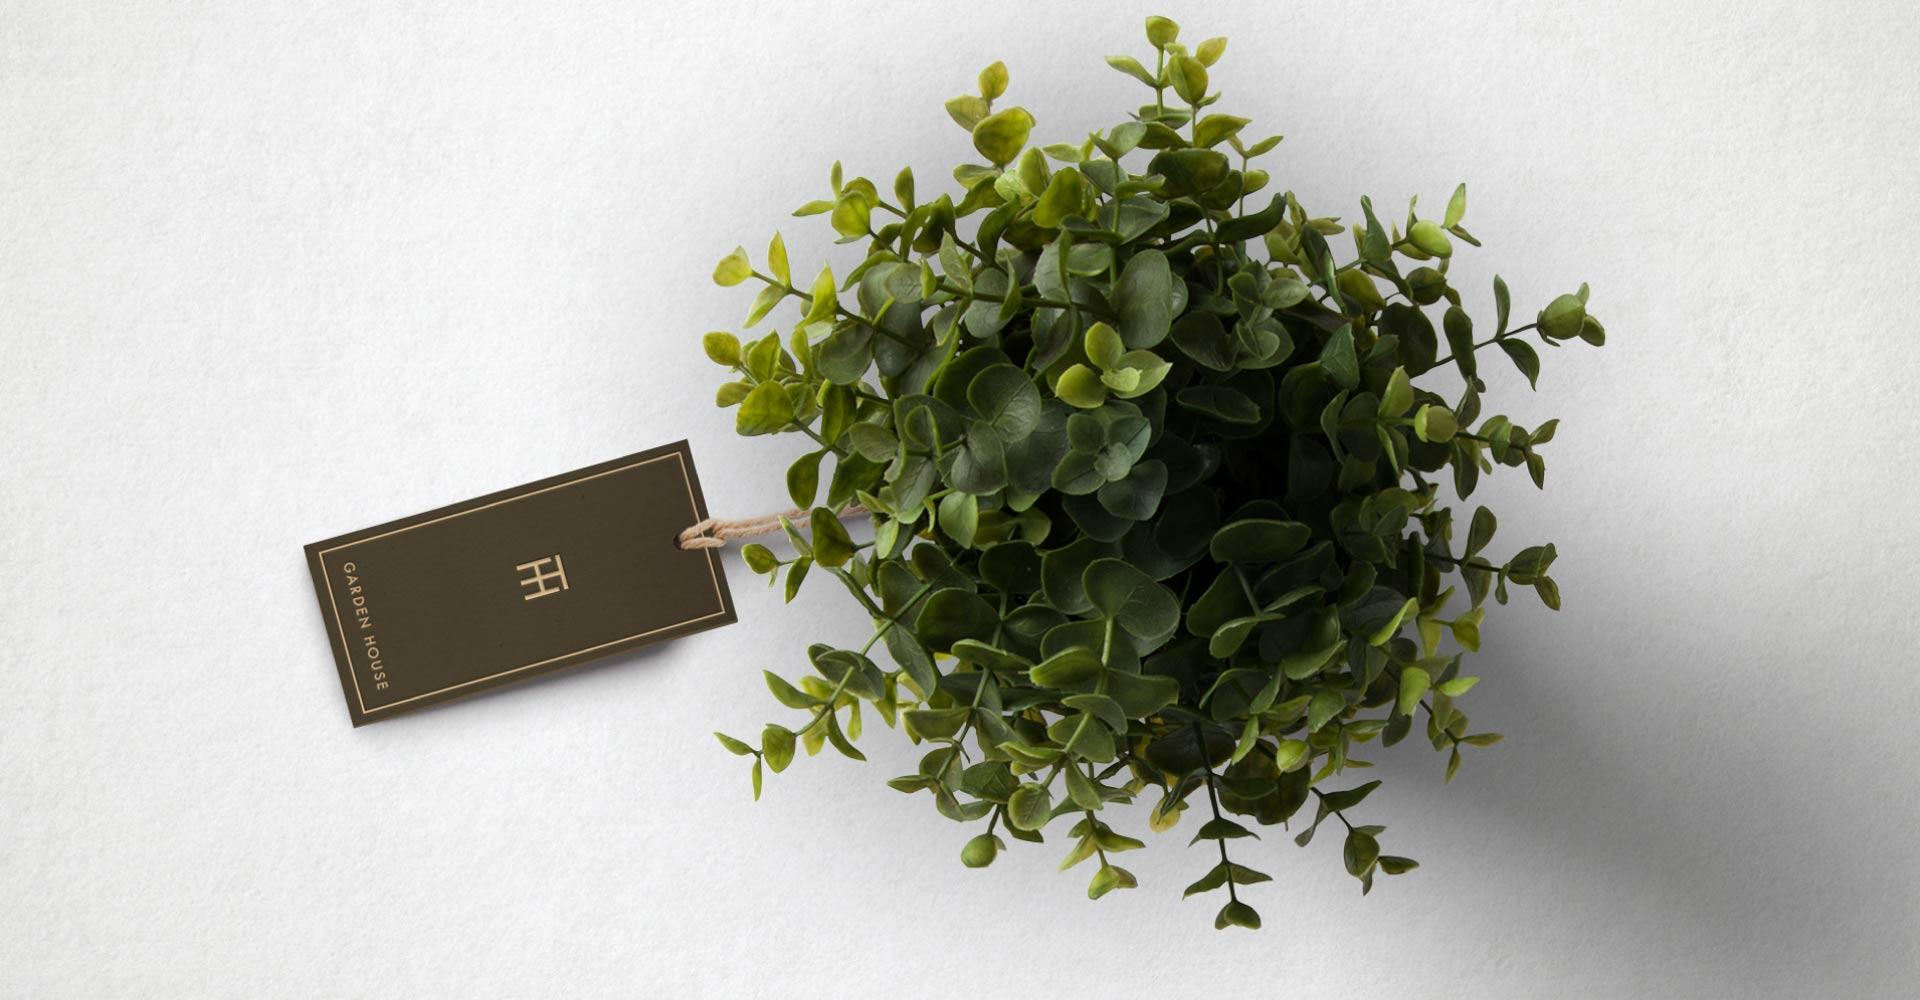 Creative_Retail_Packaging_Thompson_Hanson_Branding_11.jpg